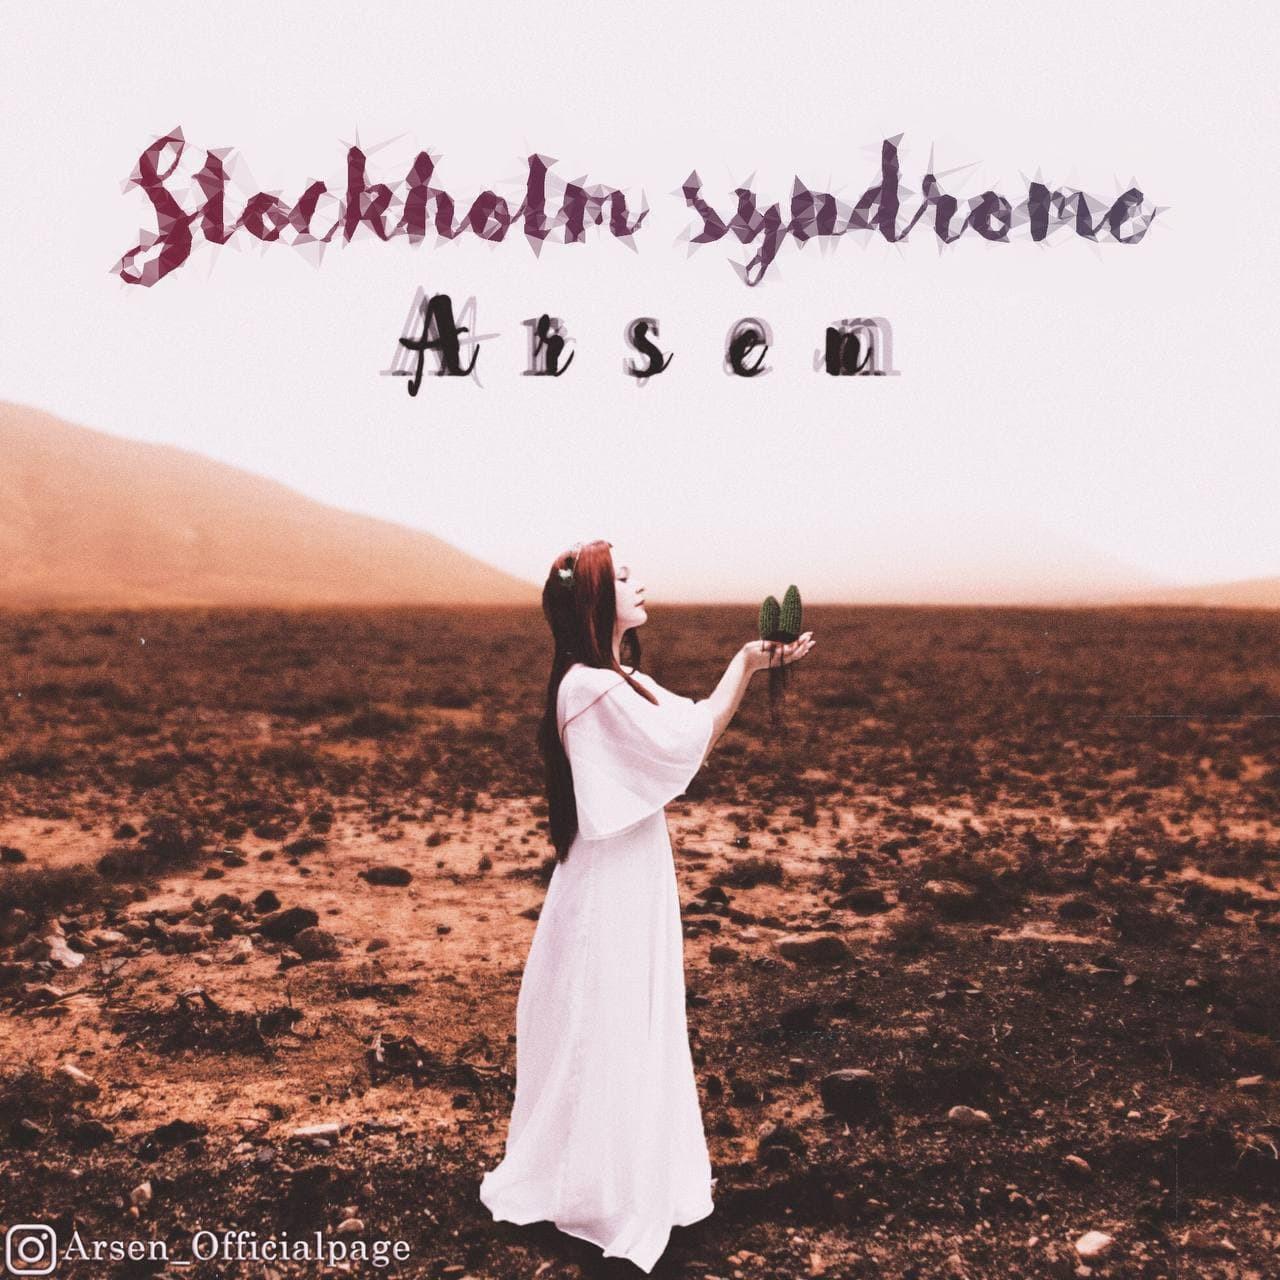 Arsen - Stockholm Syndrome